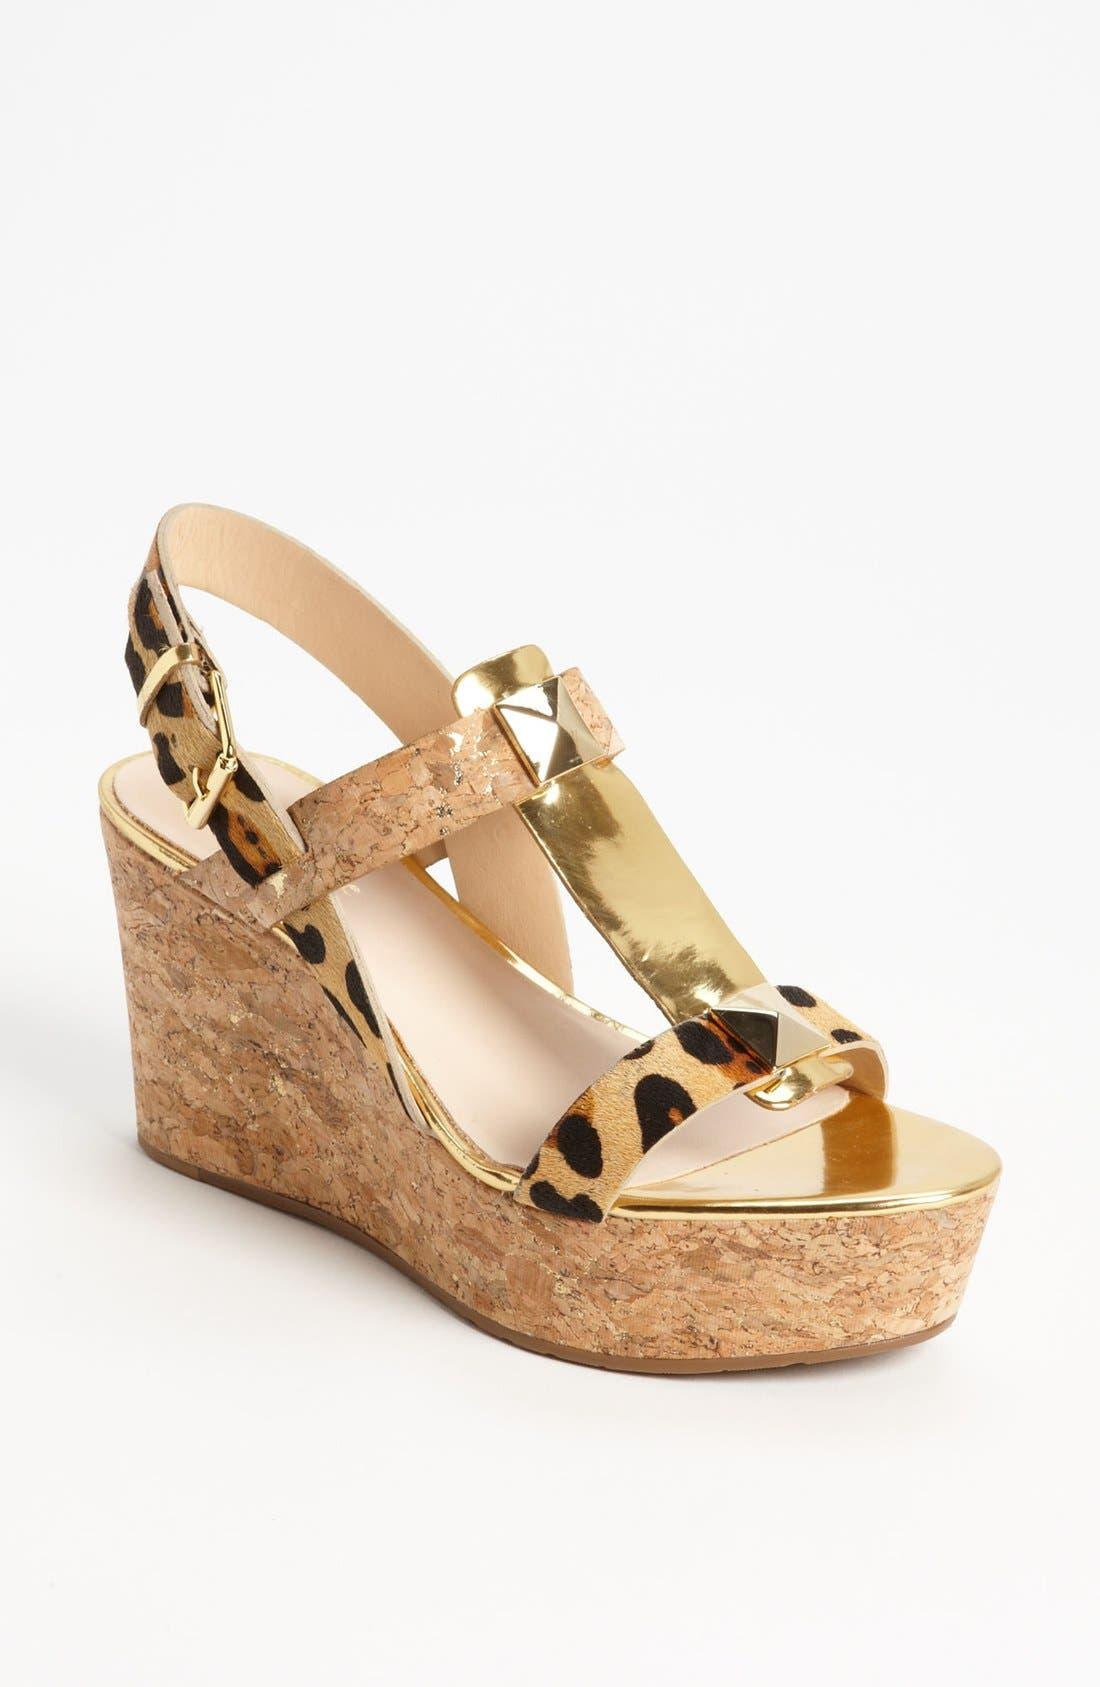 Alternate Image 1 Selected - kate spade new york 'tegan' sandal